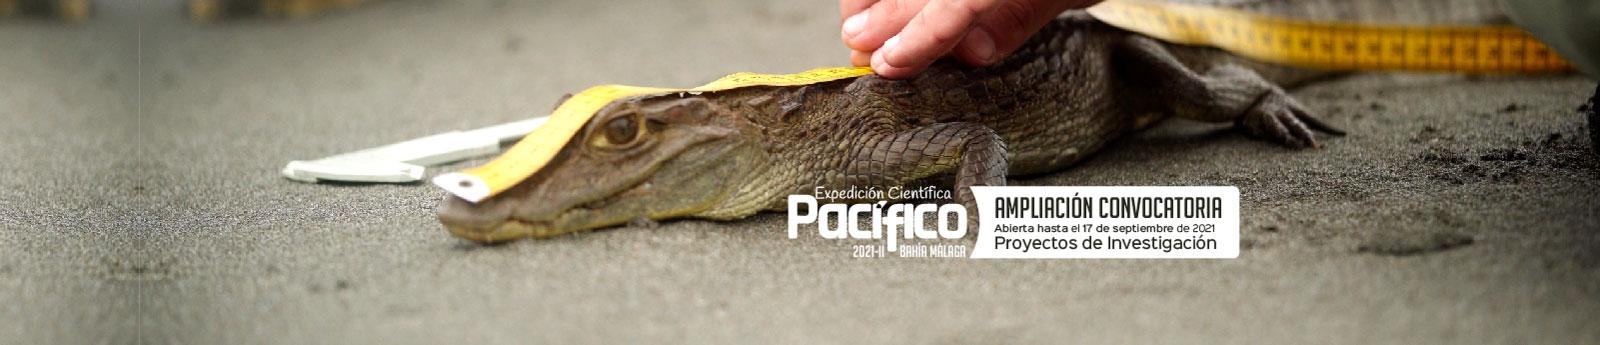 Abrimos convocatoria para proyectos de investigación Expedición Científica Pacífico 2021-II Bahía Málaga